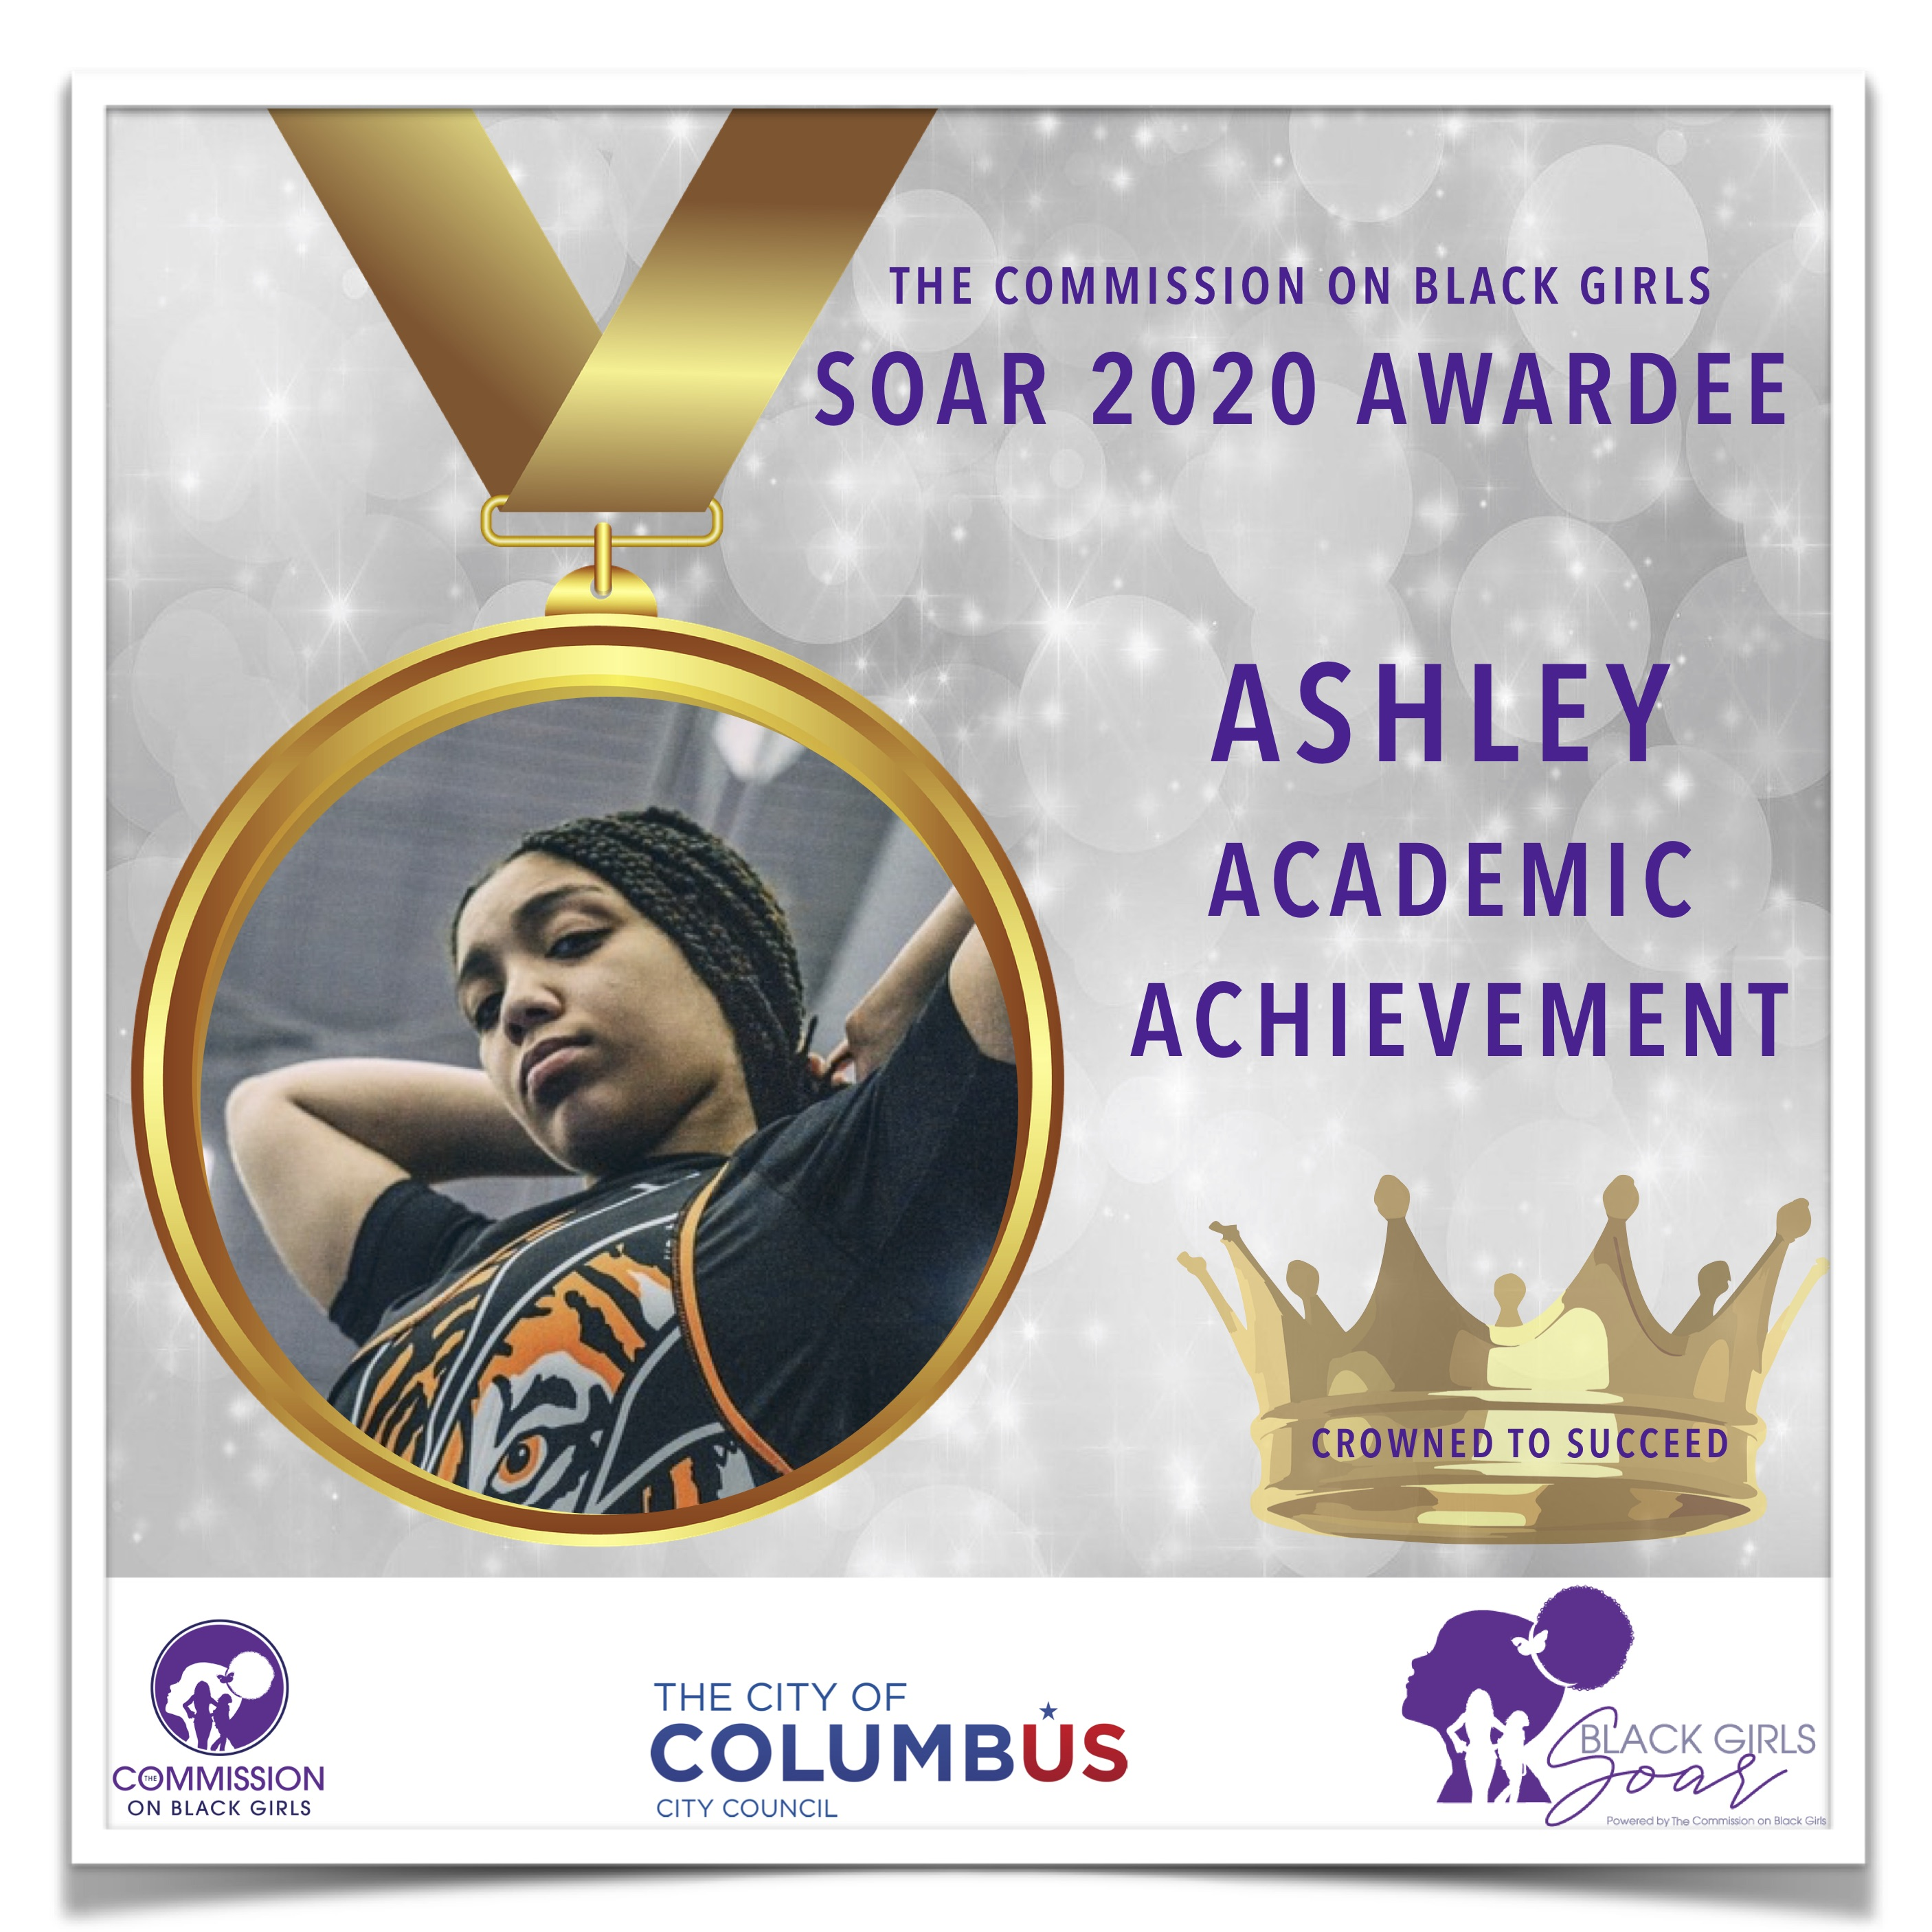 23 SOAR 2020 AshleyAcademic Achievement.